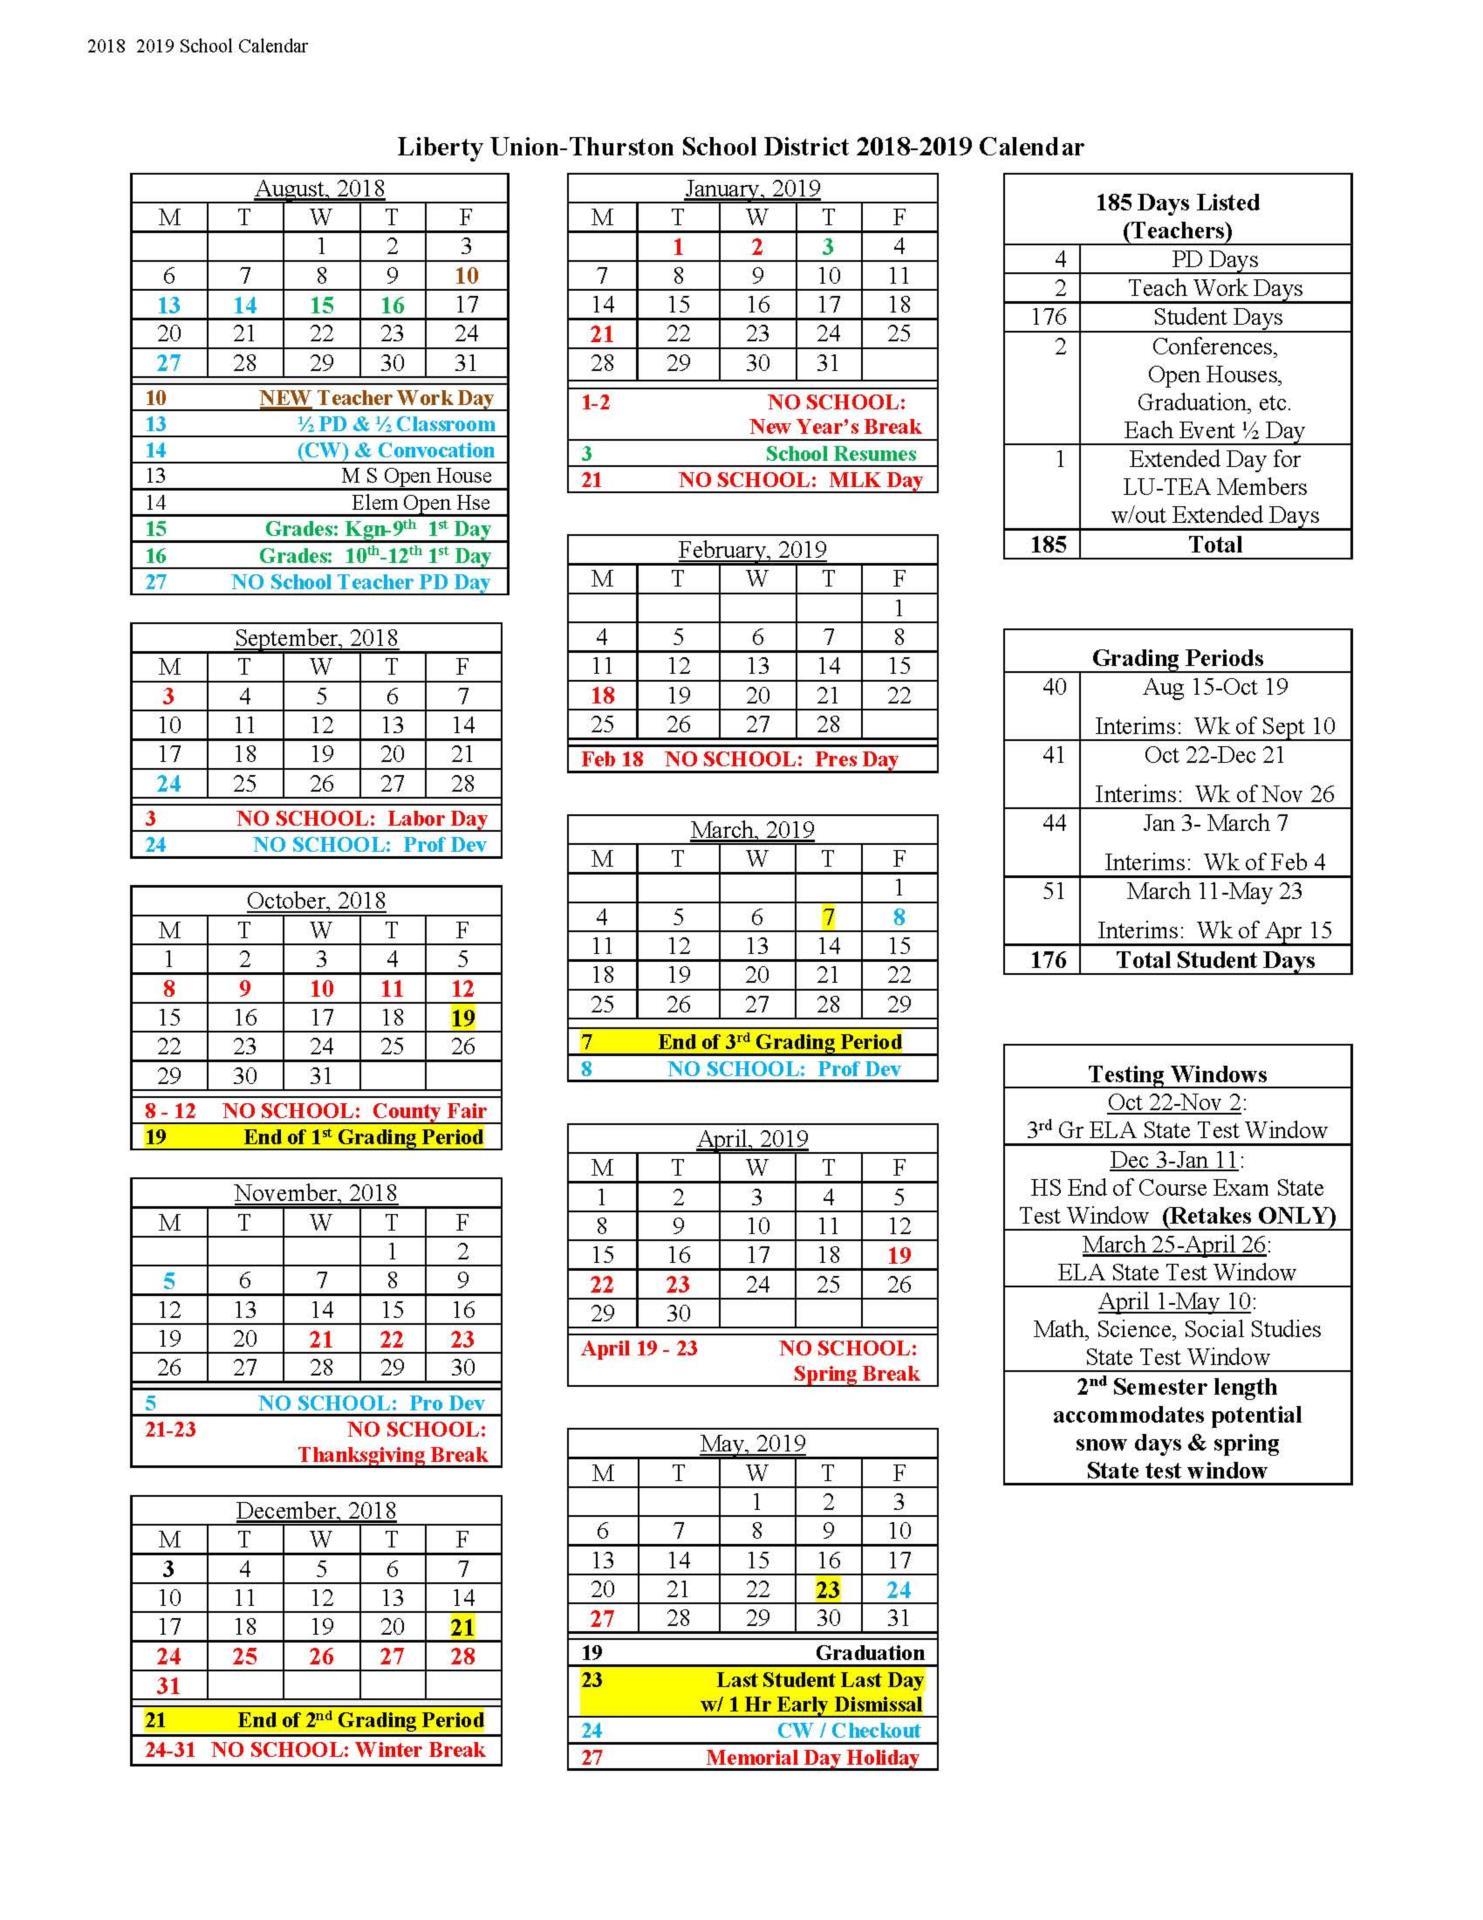 Liberty Calendar 2020 Liberty Union Thurston Local School District Calendar 2019 and